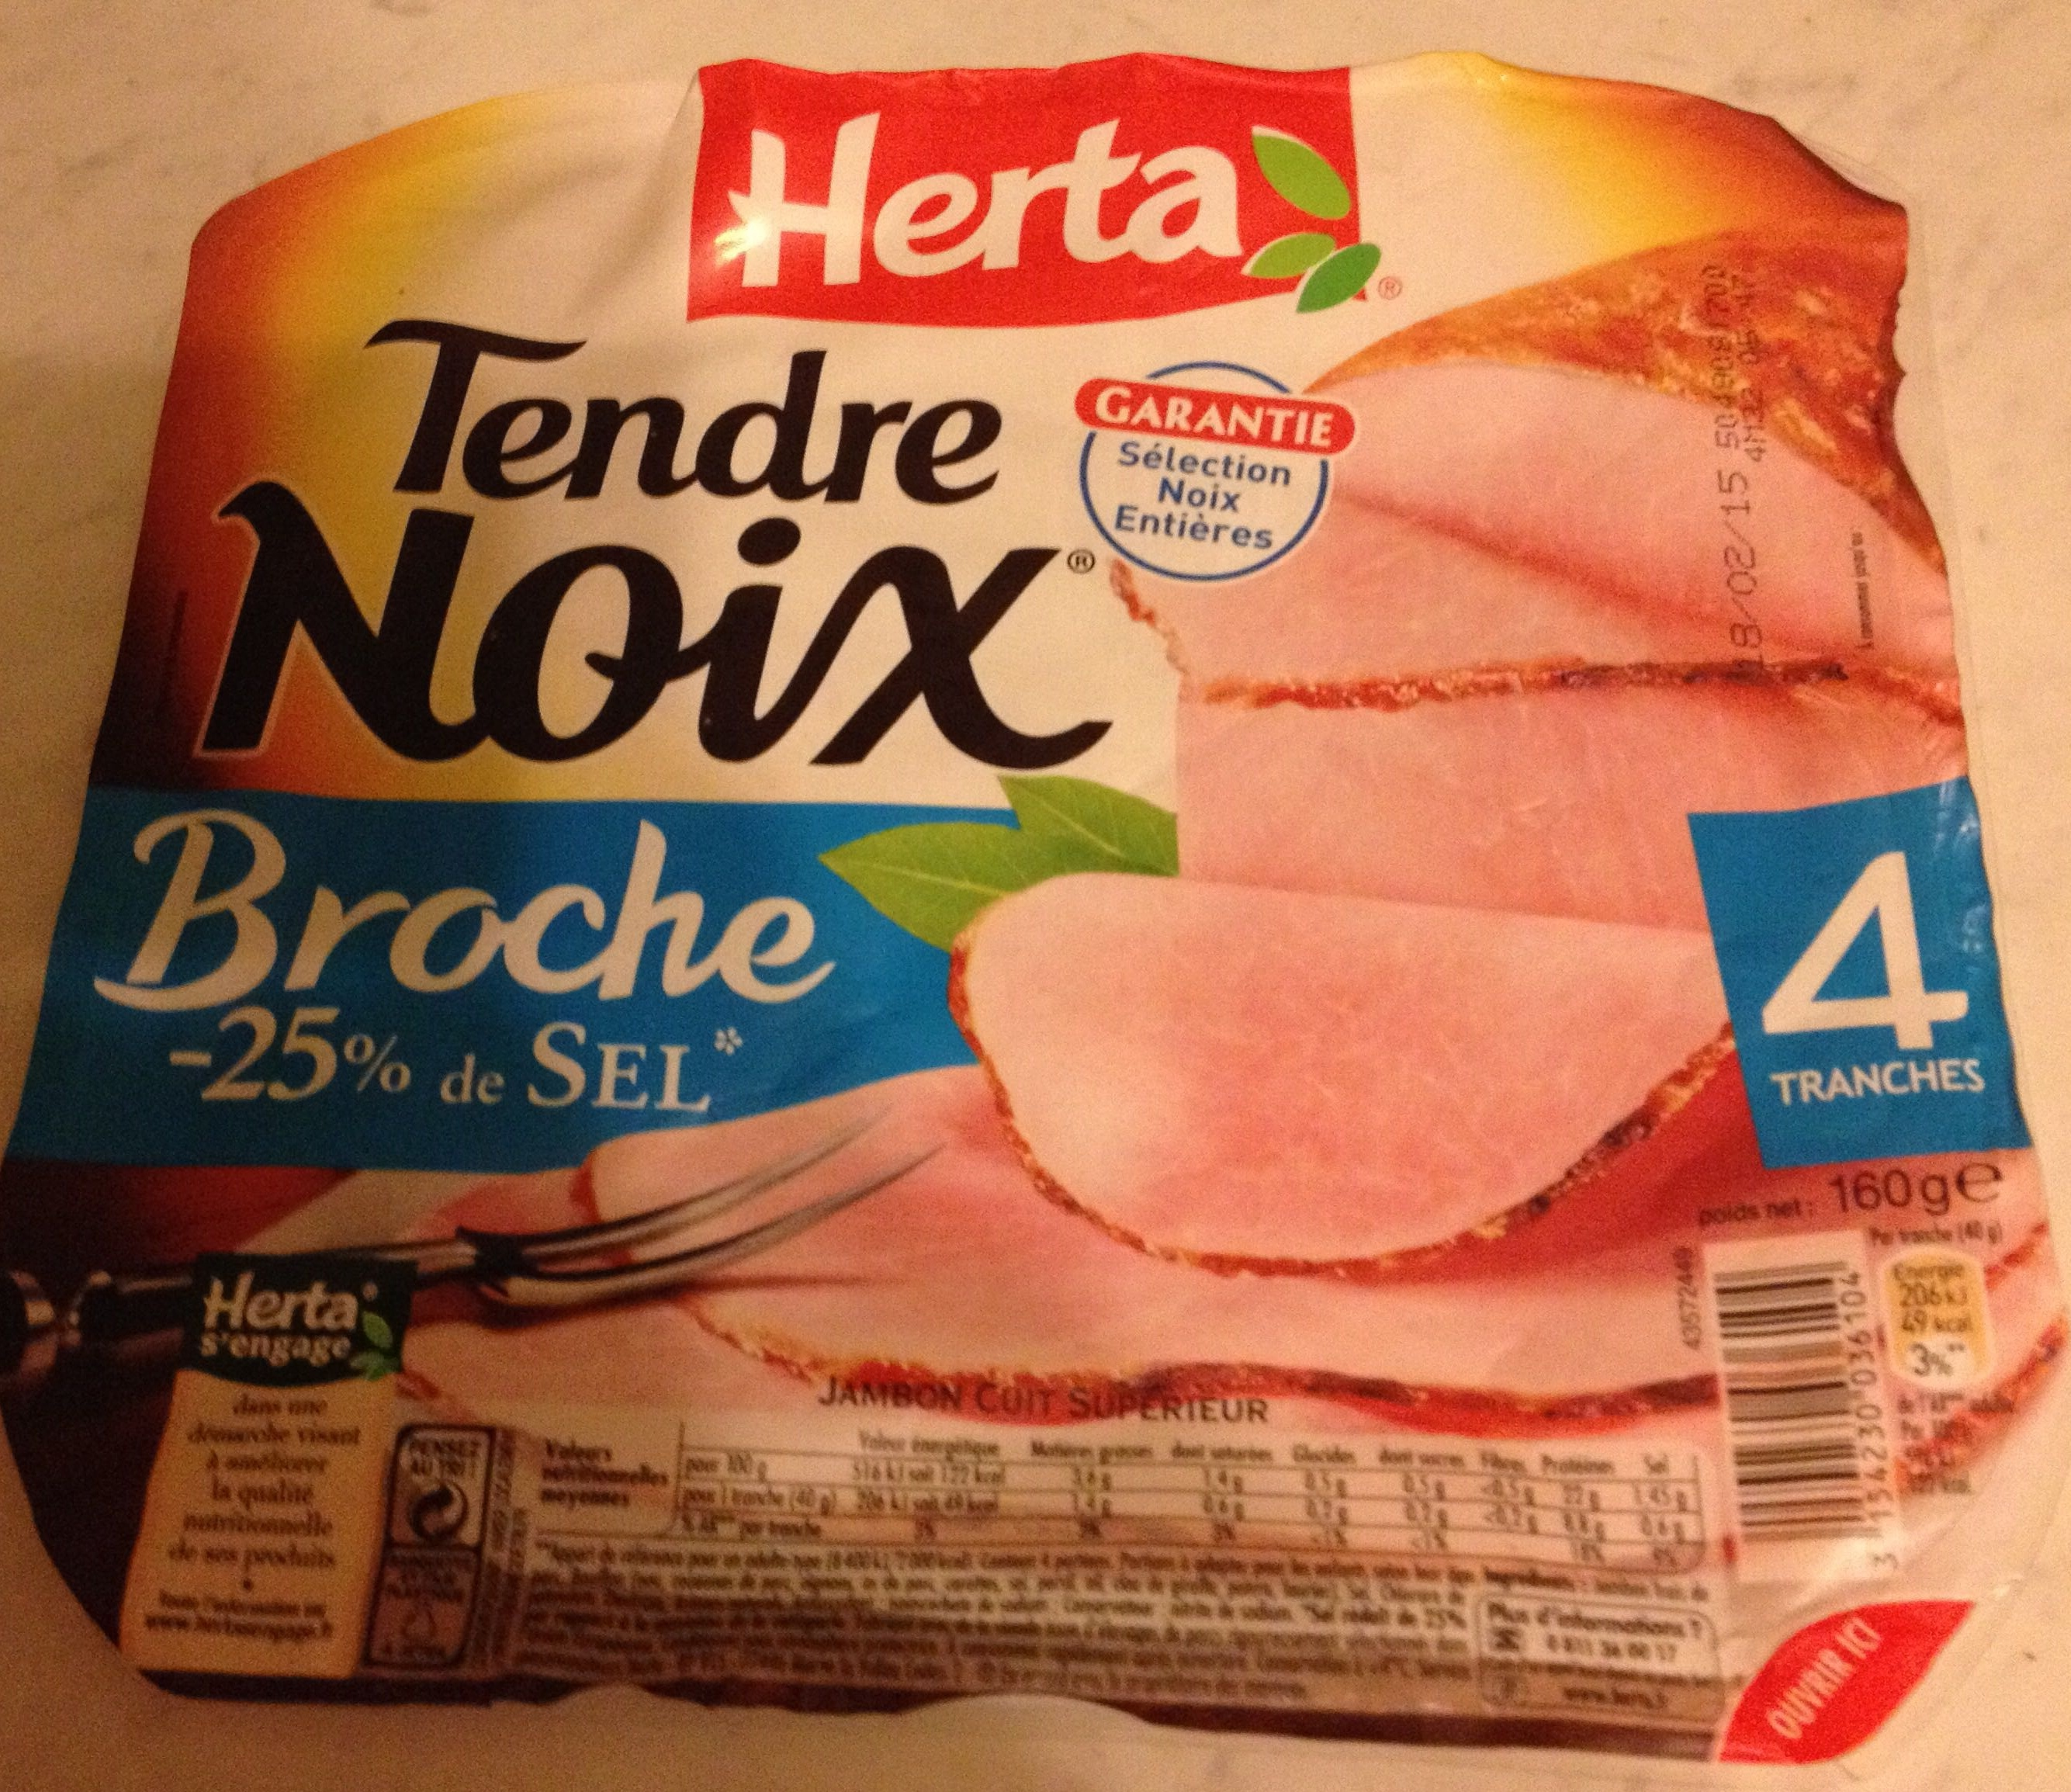 Tendre Noix, Broche (- 25 % de Sel) 4 Tranches - Product - fr